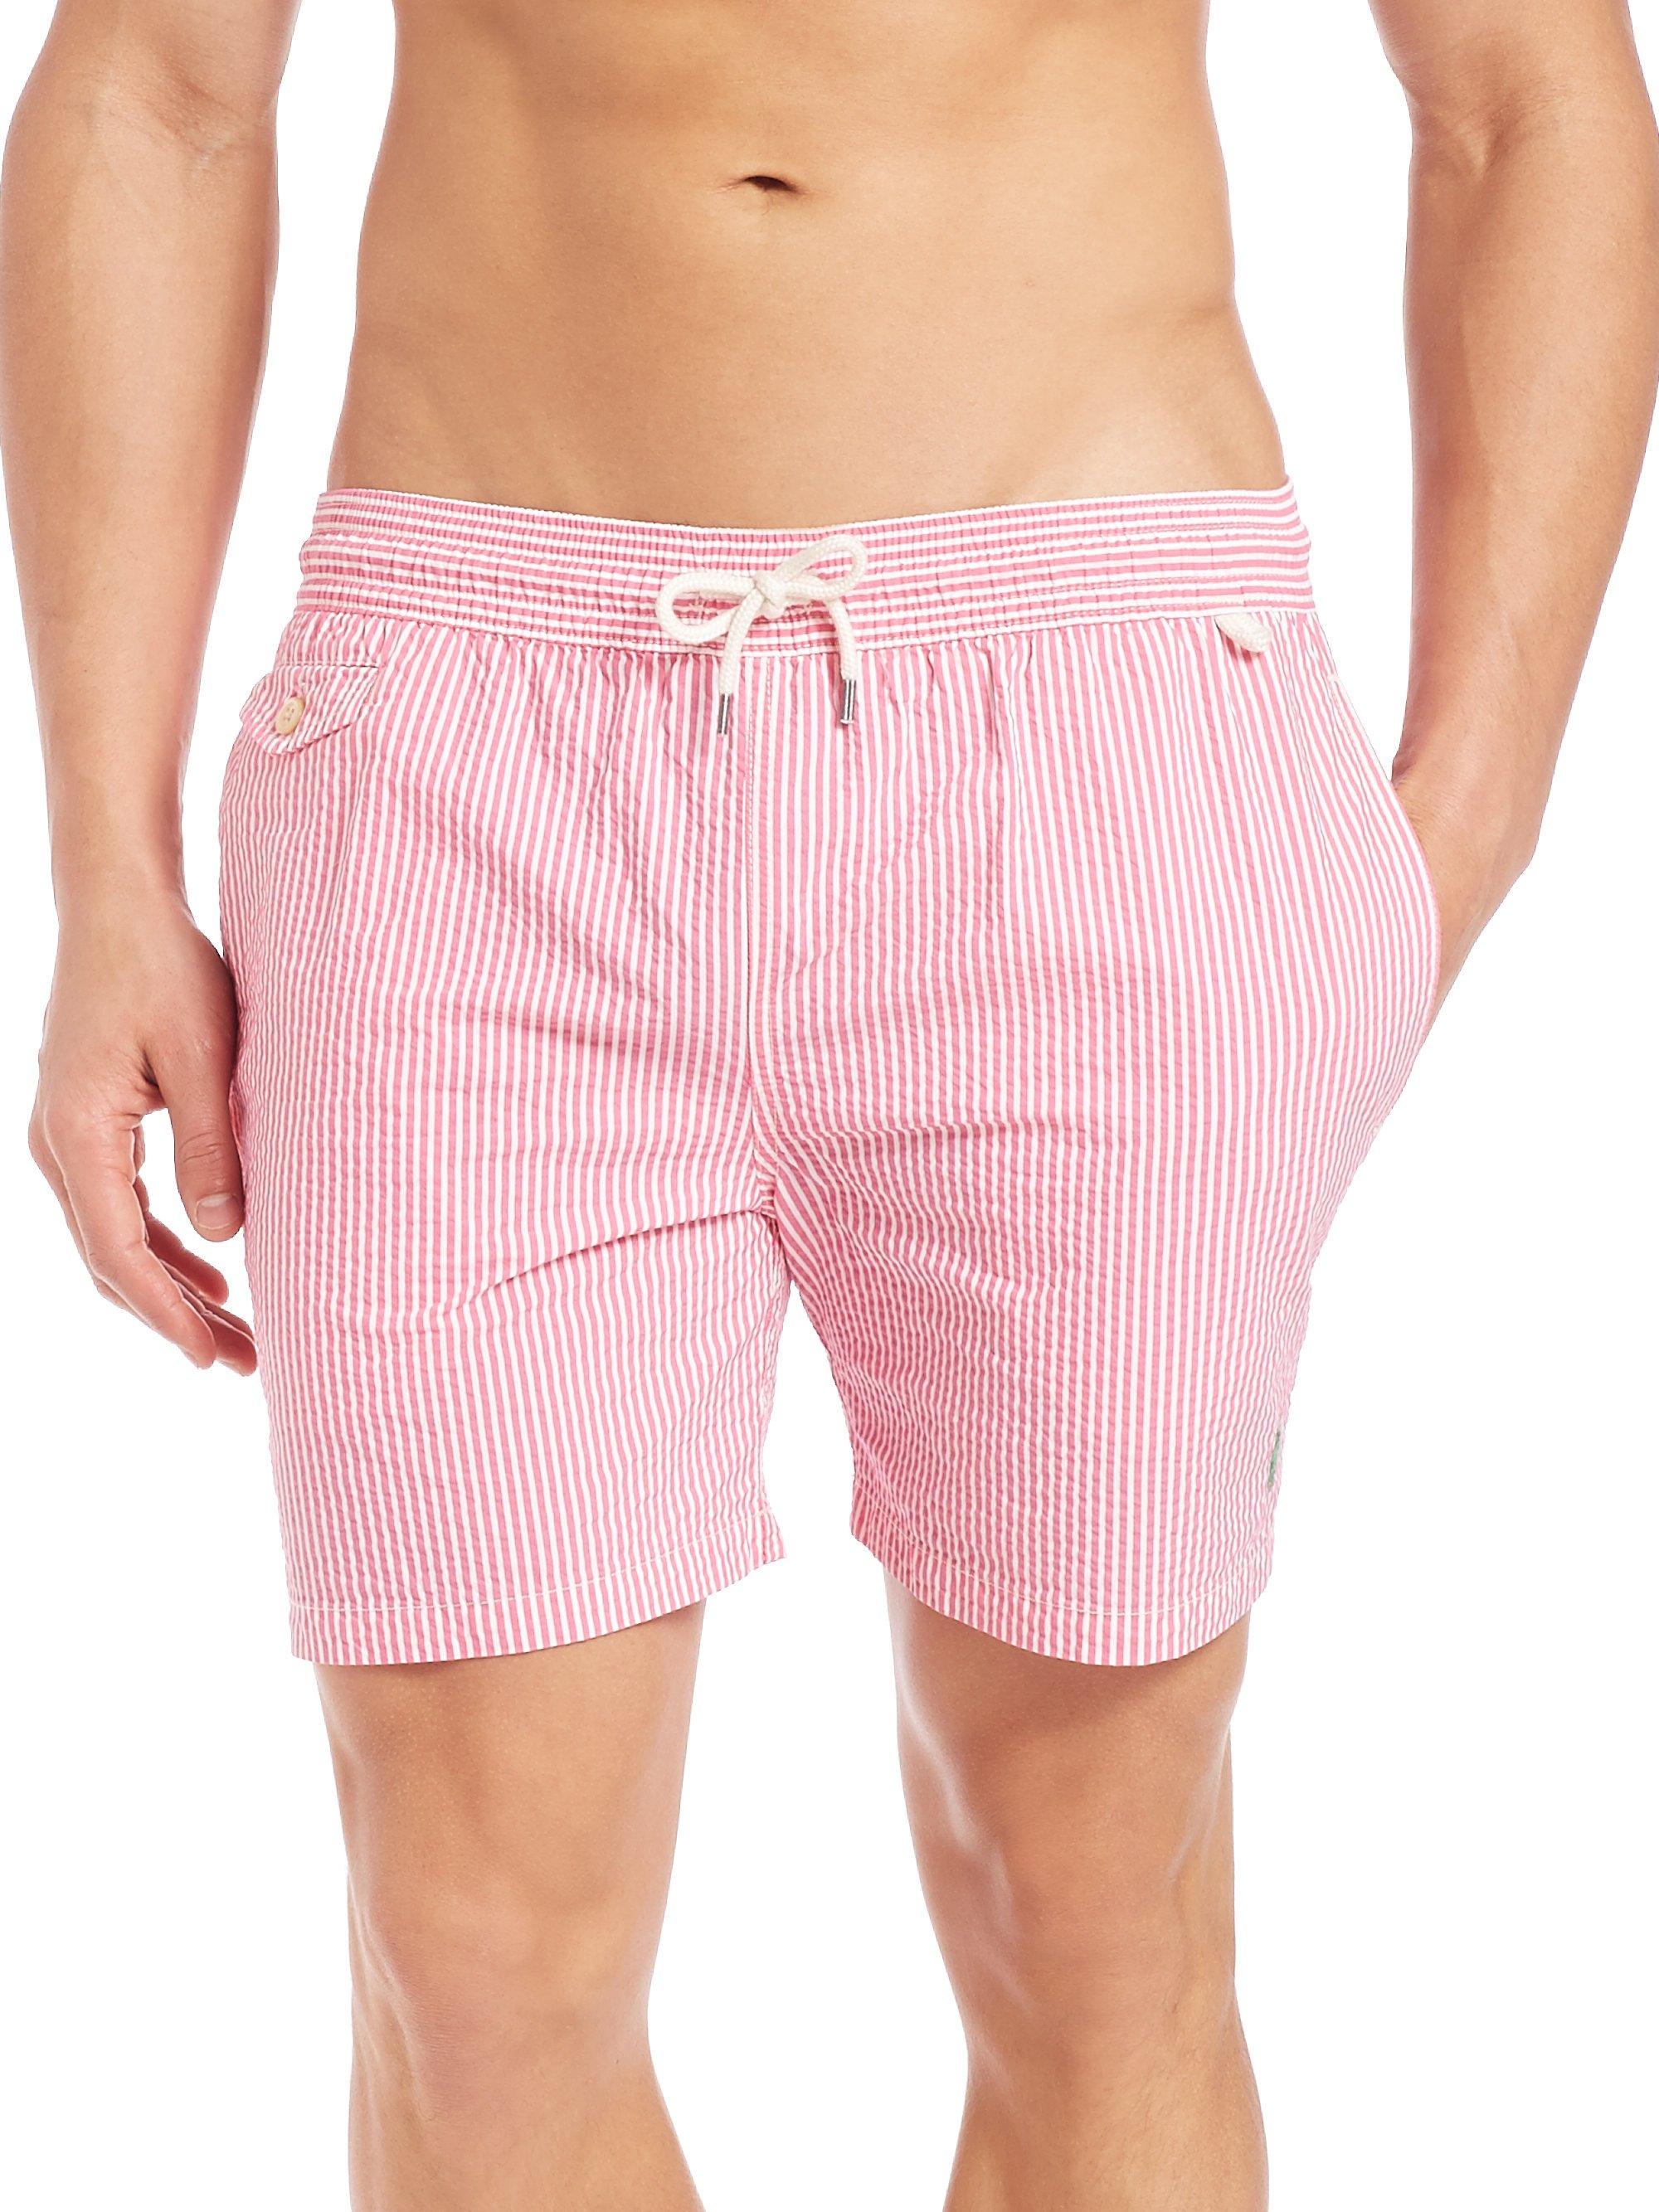 691f4e844c ... sweden lyst polo ralph lauren seersucker traveler swim shorts in pink  for men efa56 5fc23